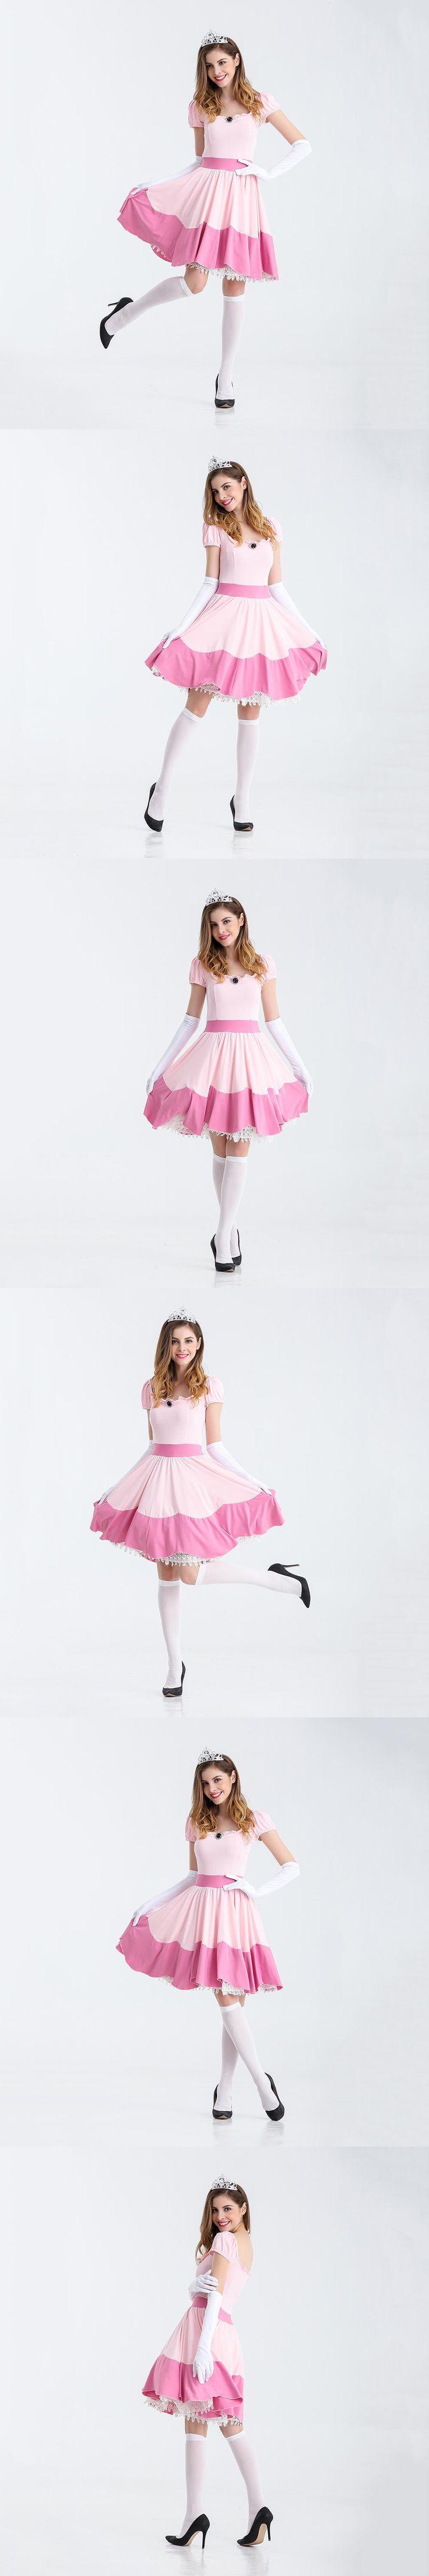 VASHEJIANG Deluxe Adult Princess Peach Costume Women Princess Peach Super Mario Bros Party Cosplay Costumes Halloween Costumes